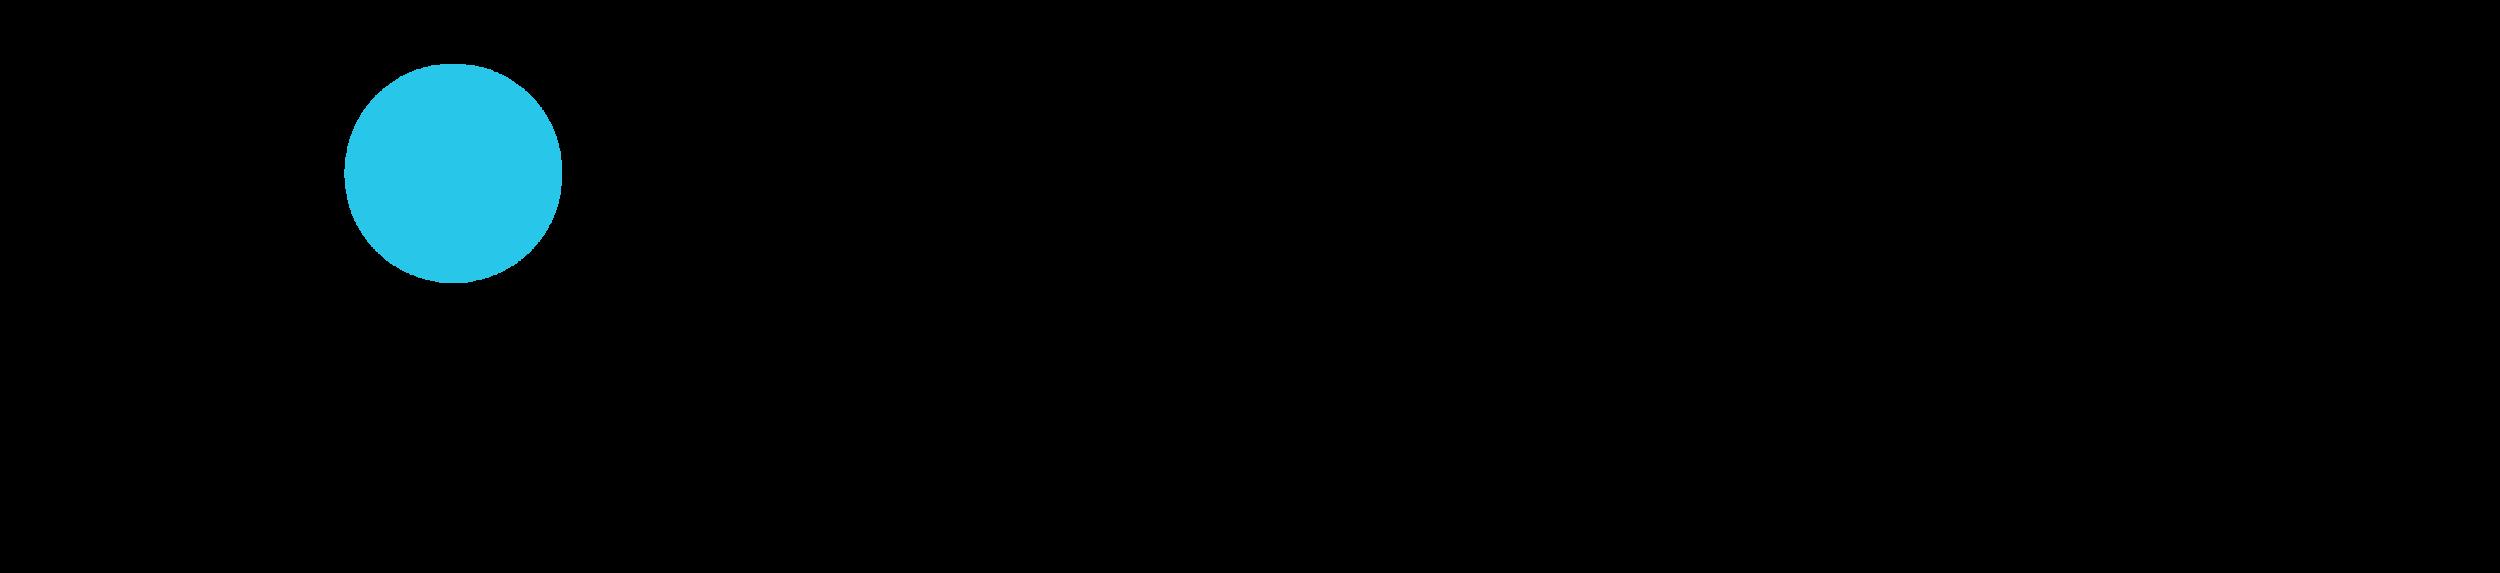 WS Text Logo_Black Color (002).png